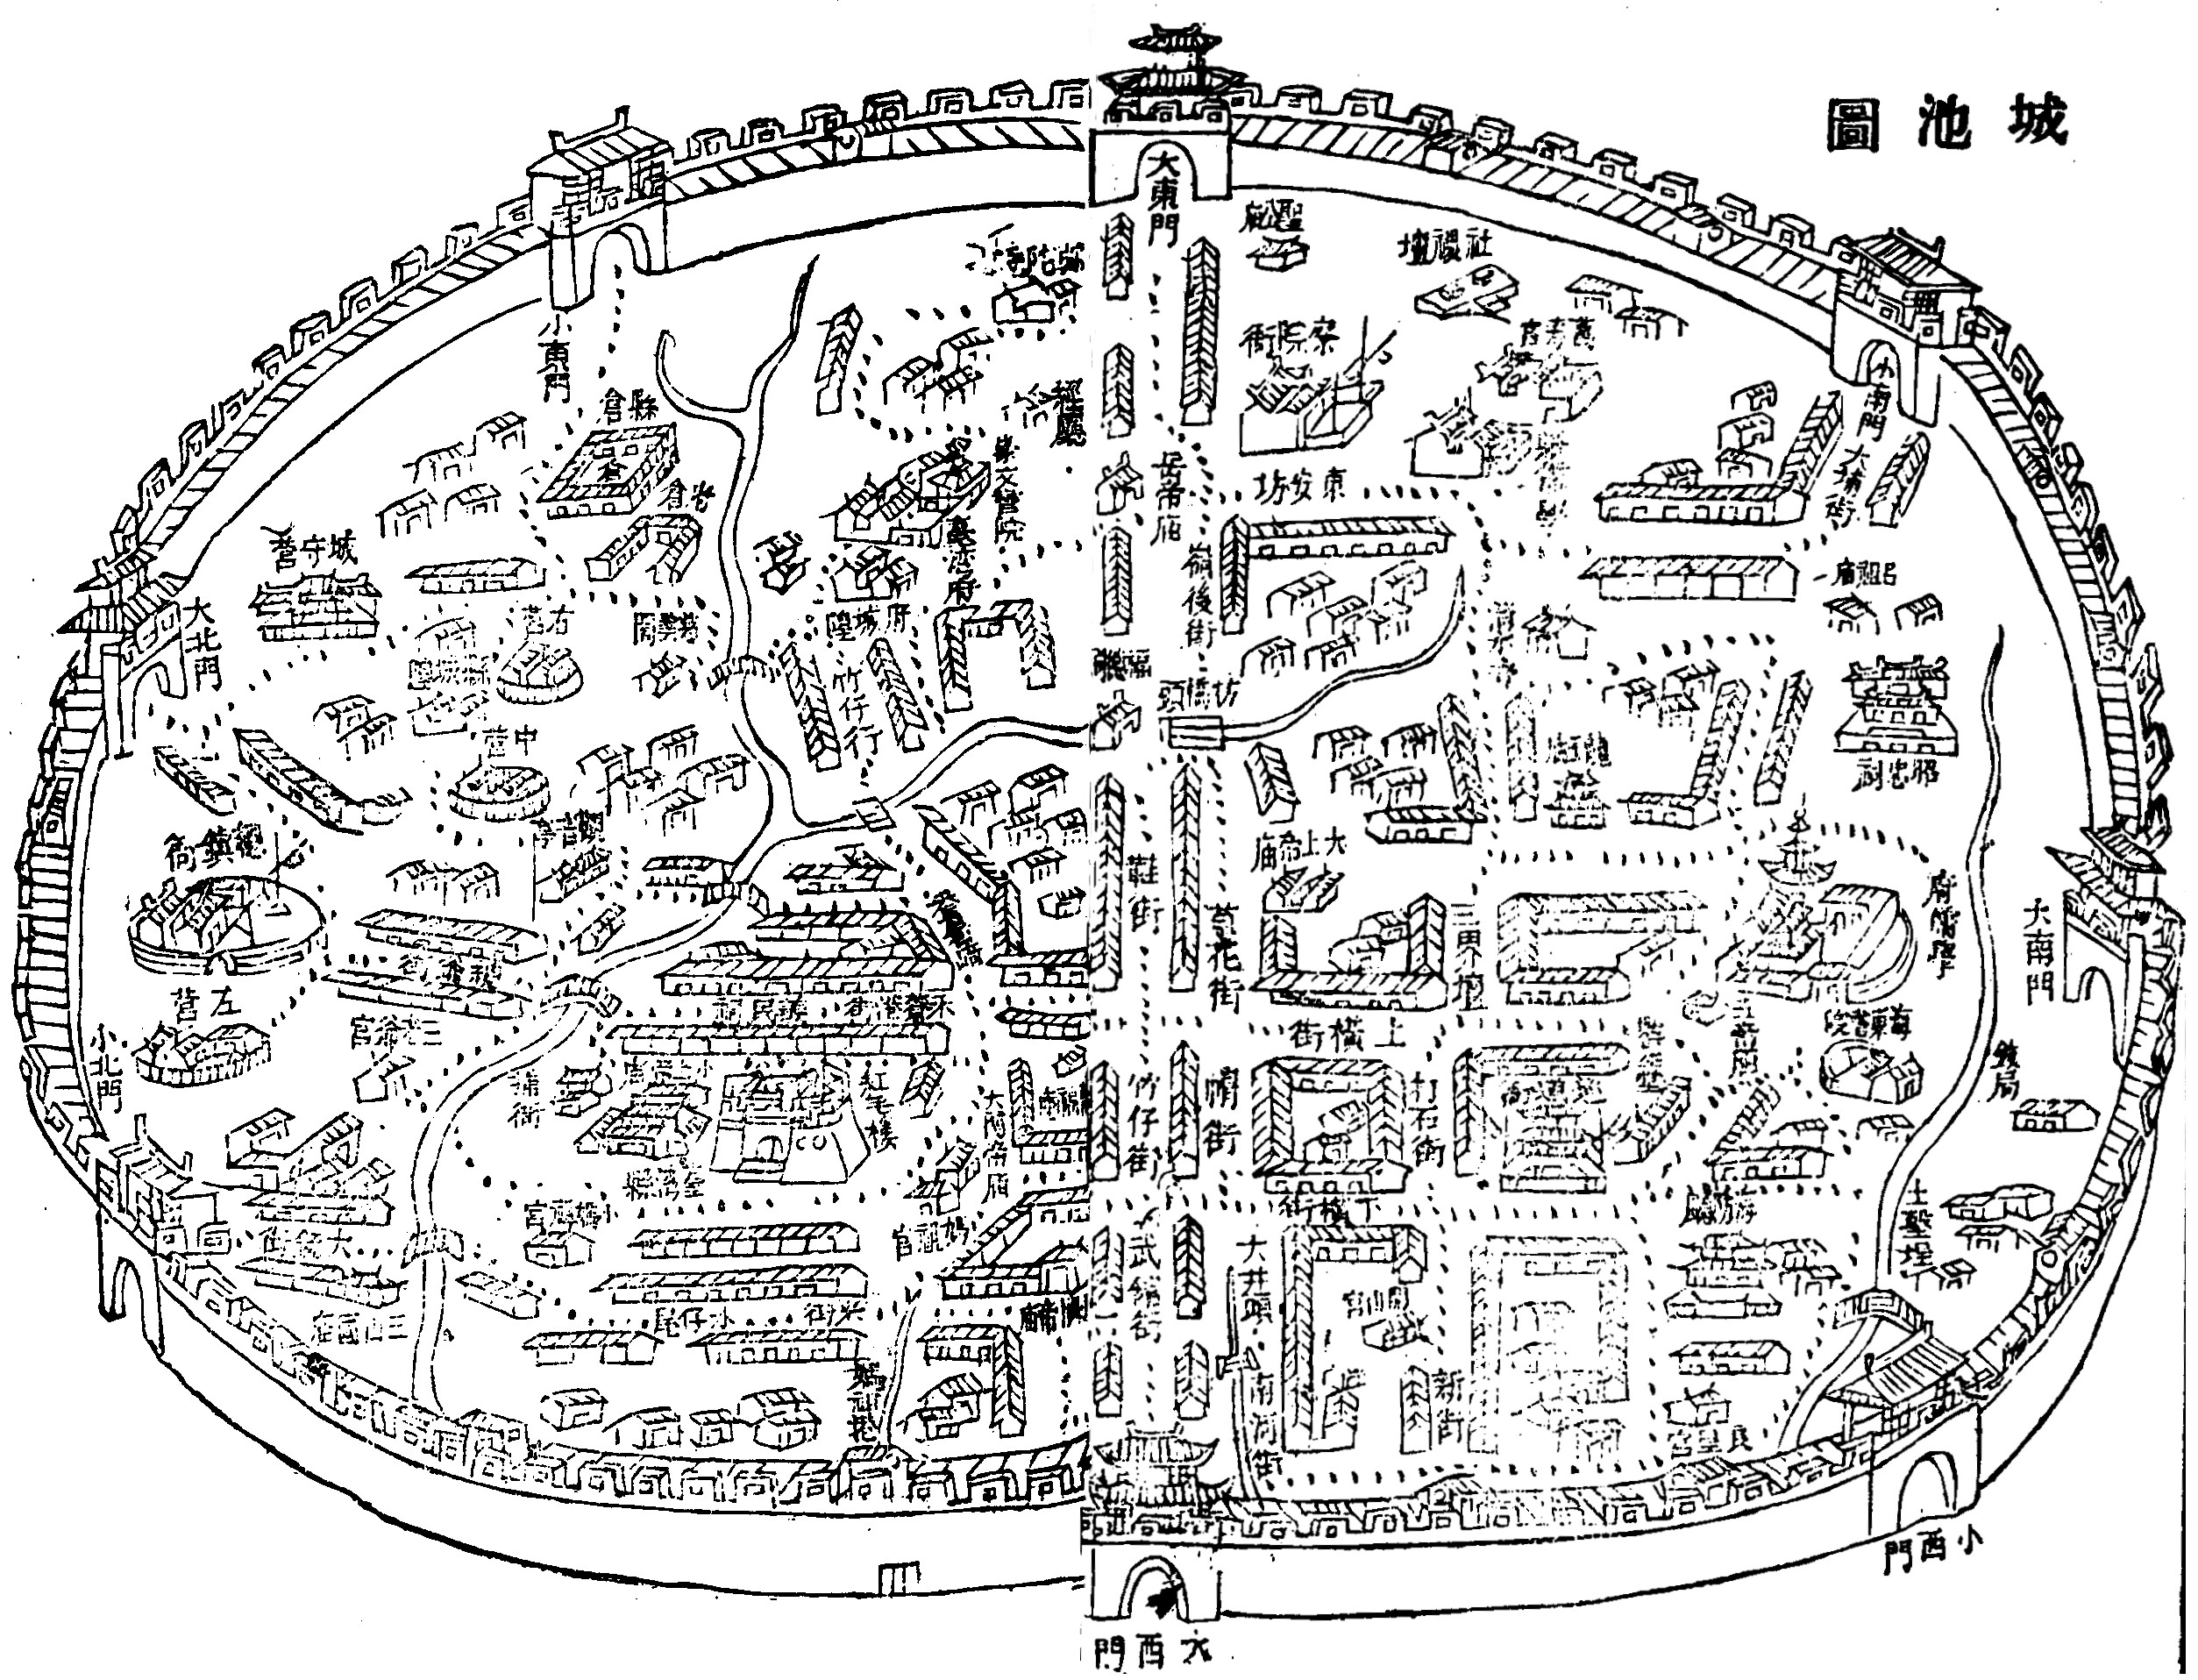 【1807 Taiwan city fortifications】由 1807年,謝金鑾《續修臺灣縣志》臺灣縣城池圖。使用來自維基共享資源的公共領域條款授權。